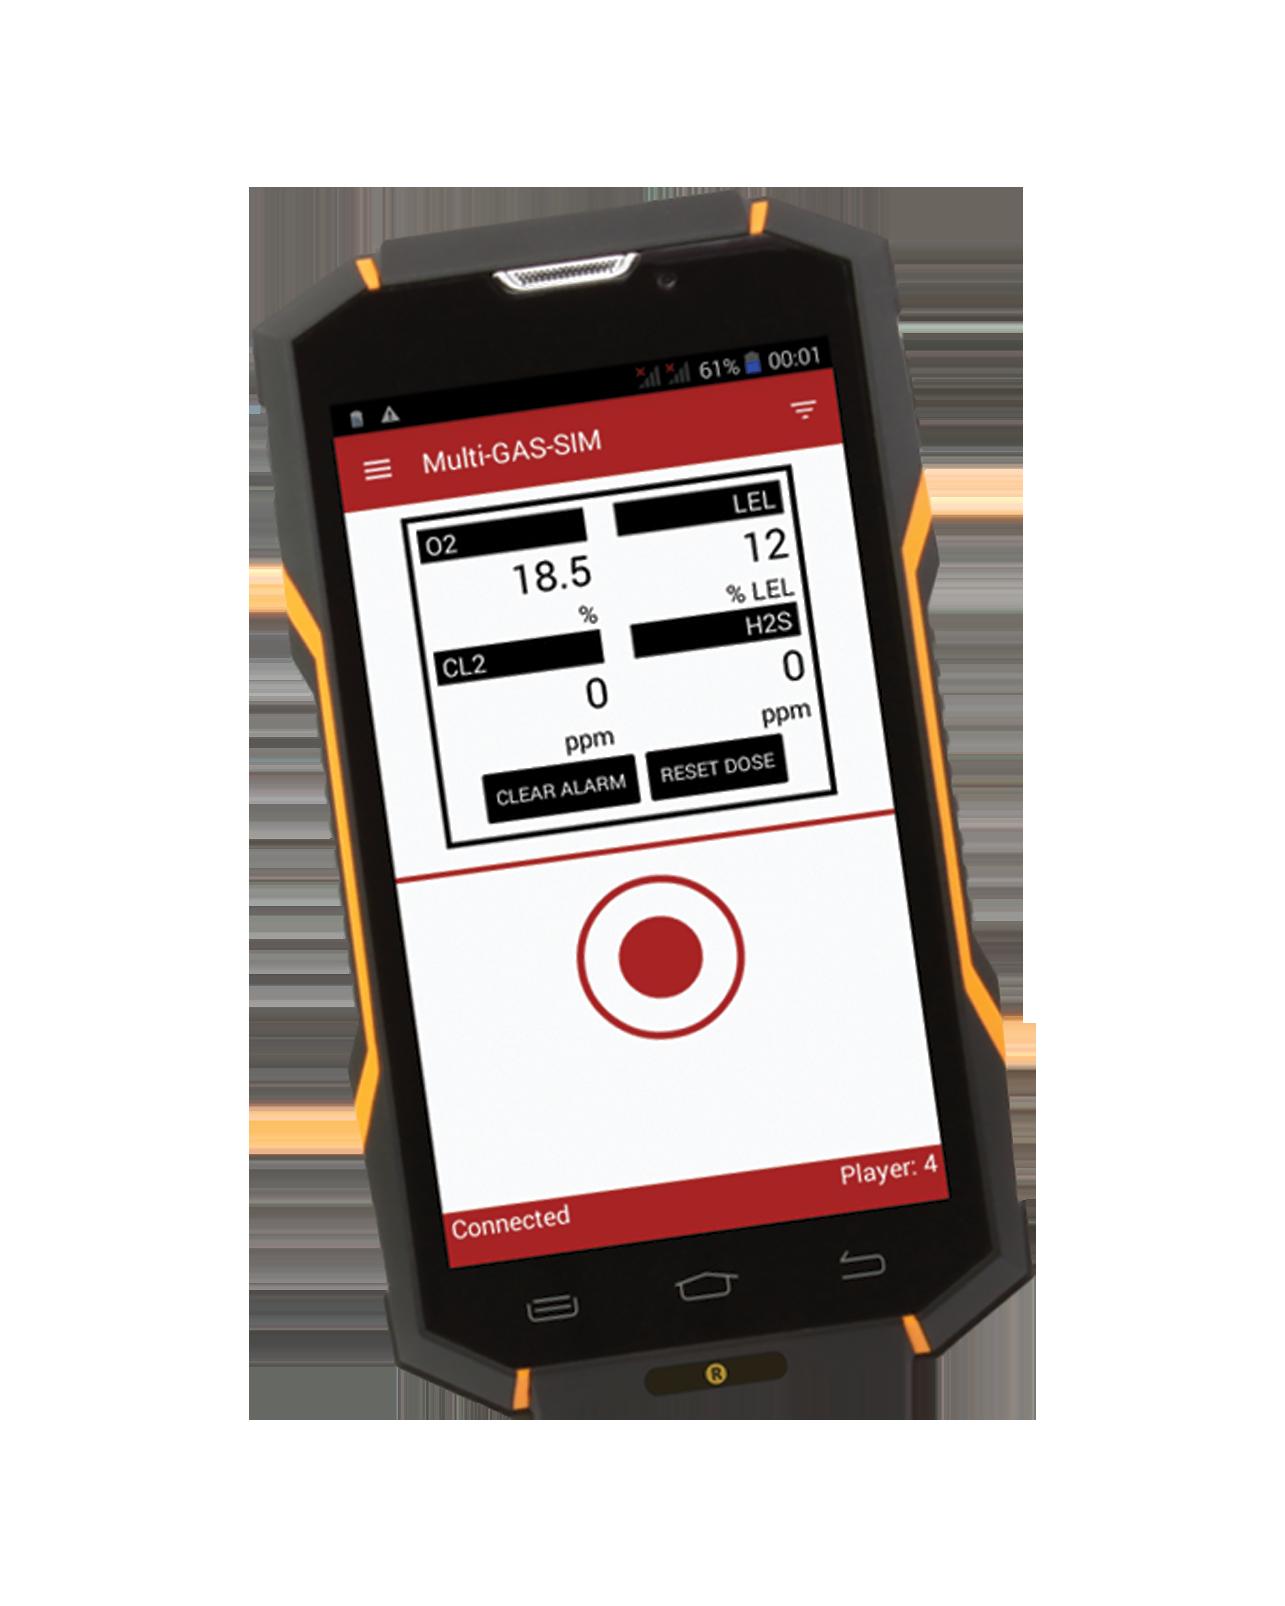 PlumeSIM SMART Tabletop CBRNe training system